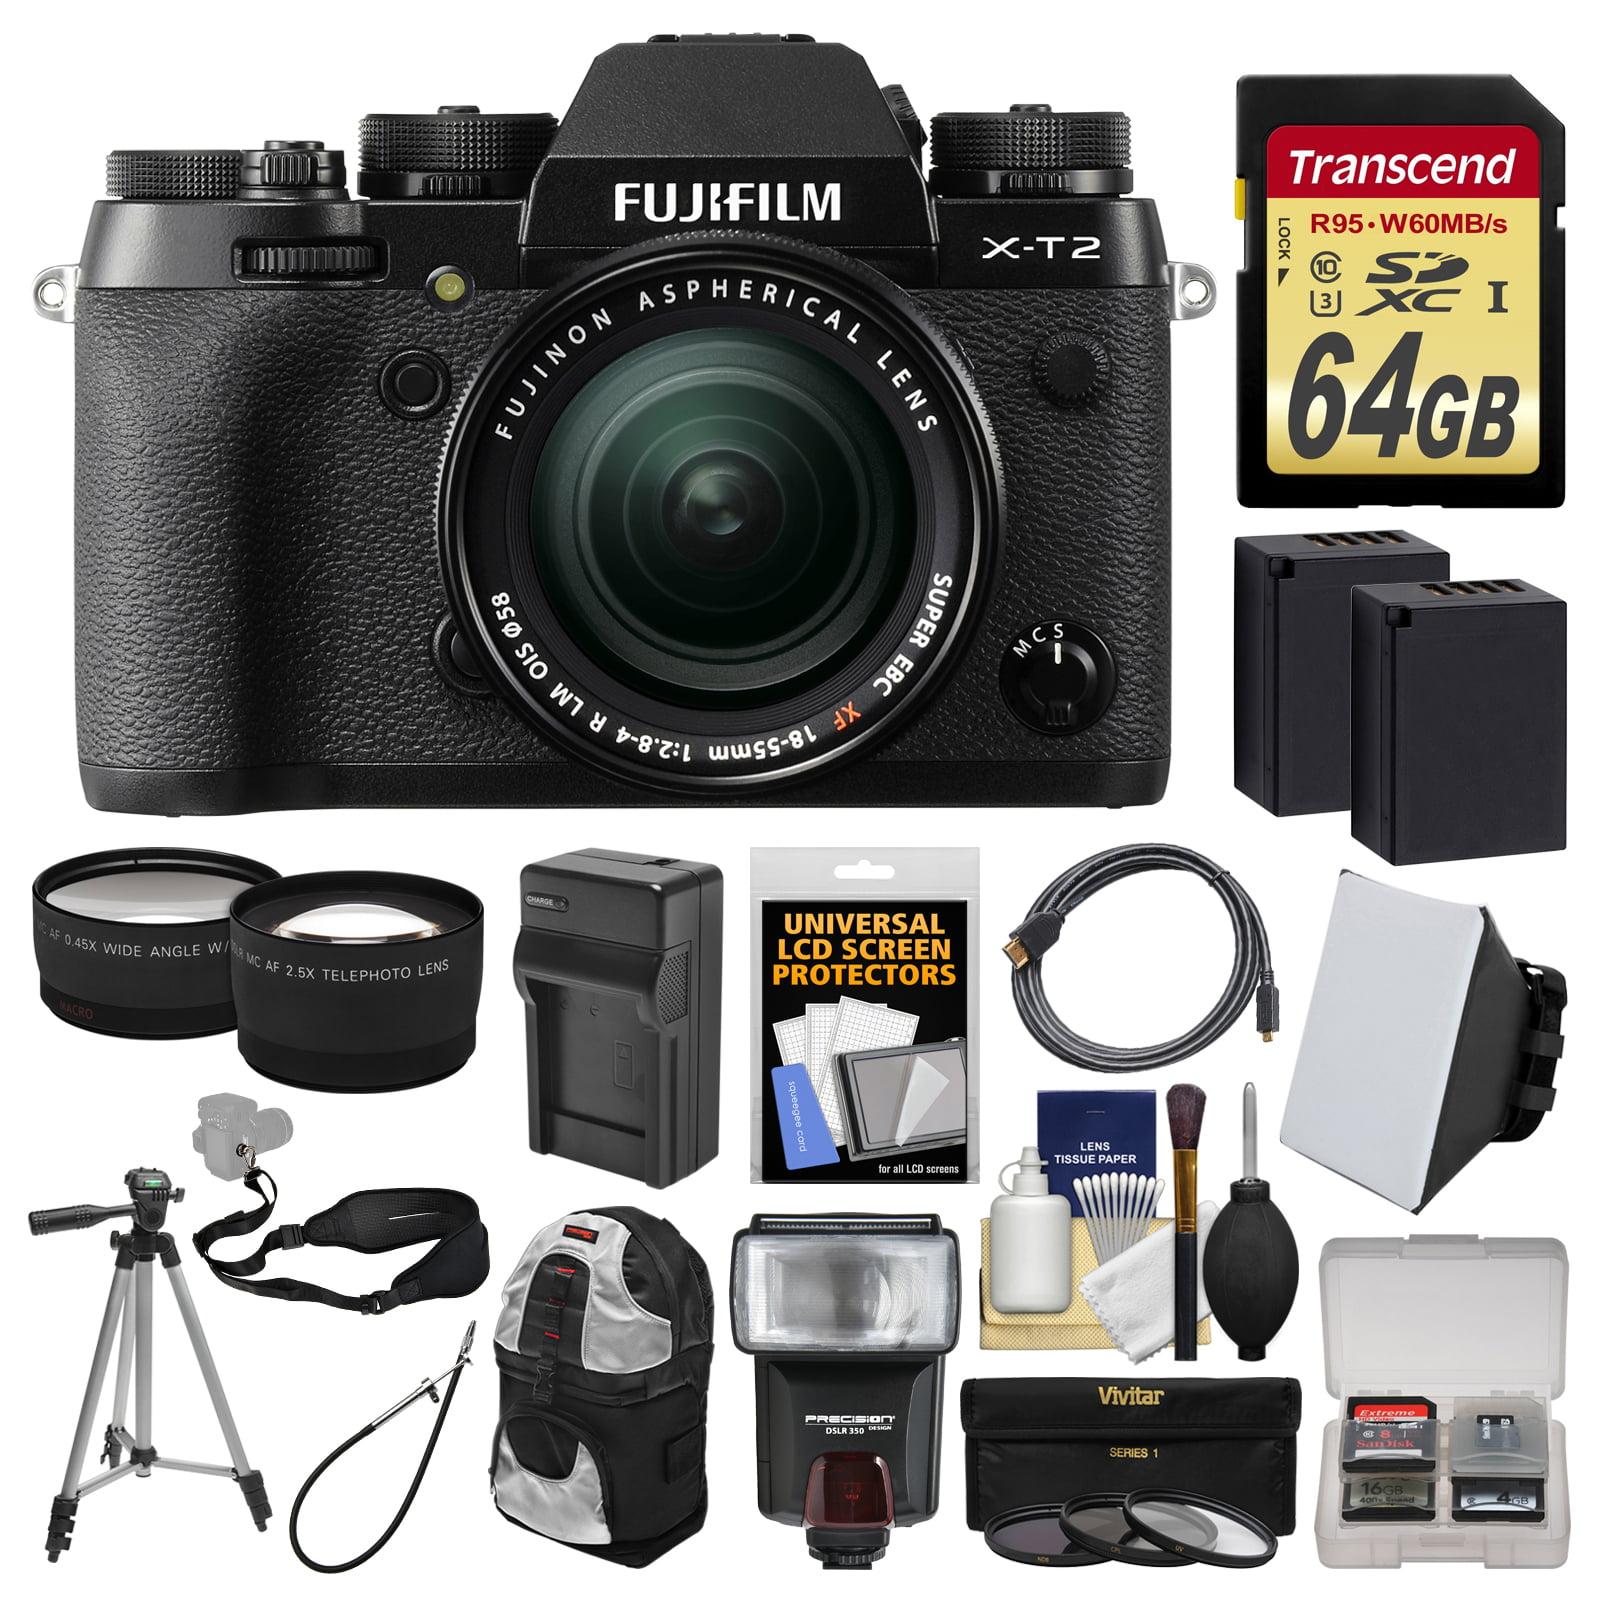 FujiFilm X-T2 4K Wi-Fi Digital Camera & 18-55mm XF Lens with 64GB Card + Case + Flash + 2 Batteries & Charger... by Fujifilm